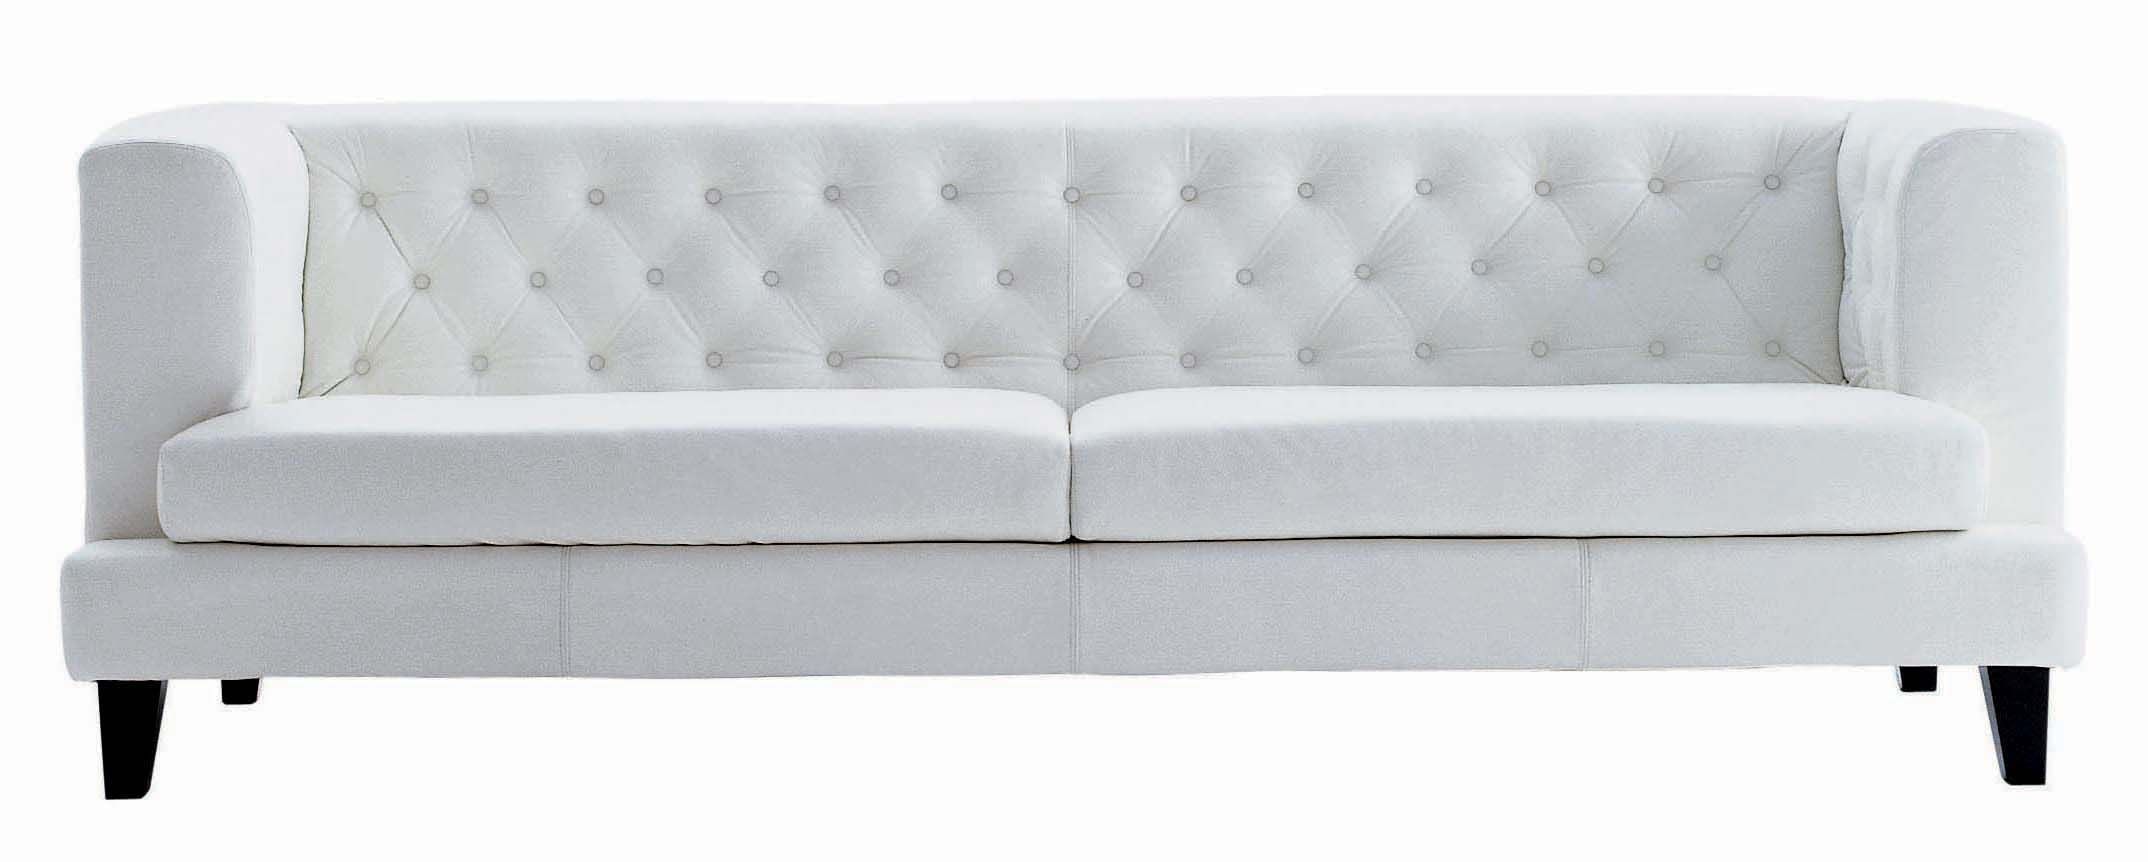 Möbel - Sofas - Hall Sofa 3-Sitzer,  Lederausführung - Driade - Leder kapitoniert weiß - Holz, Leder